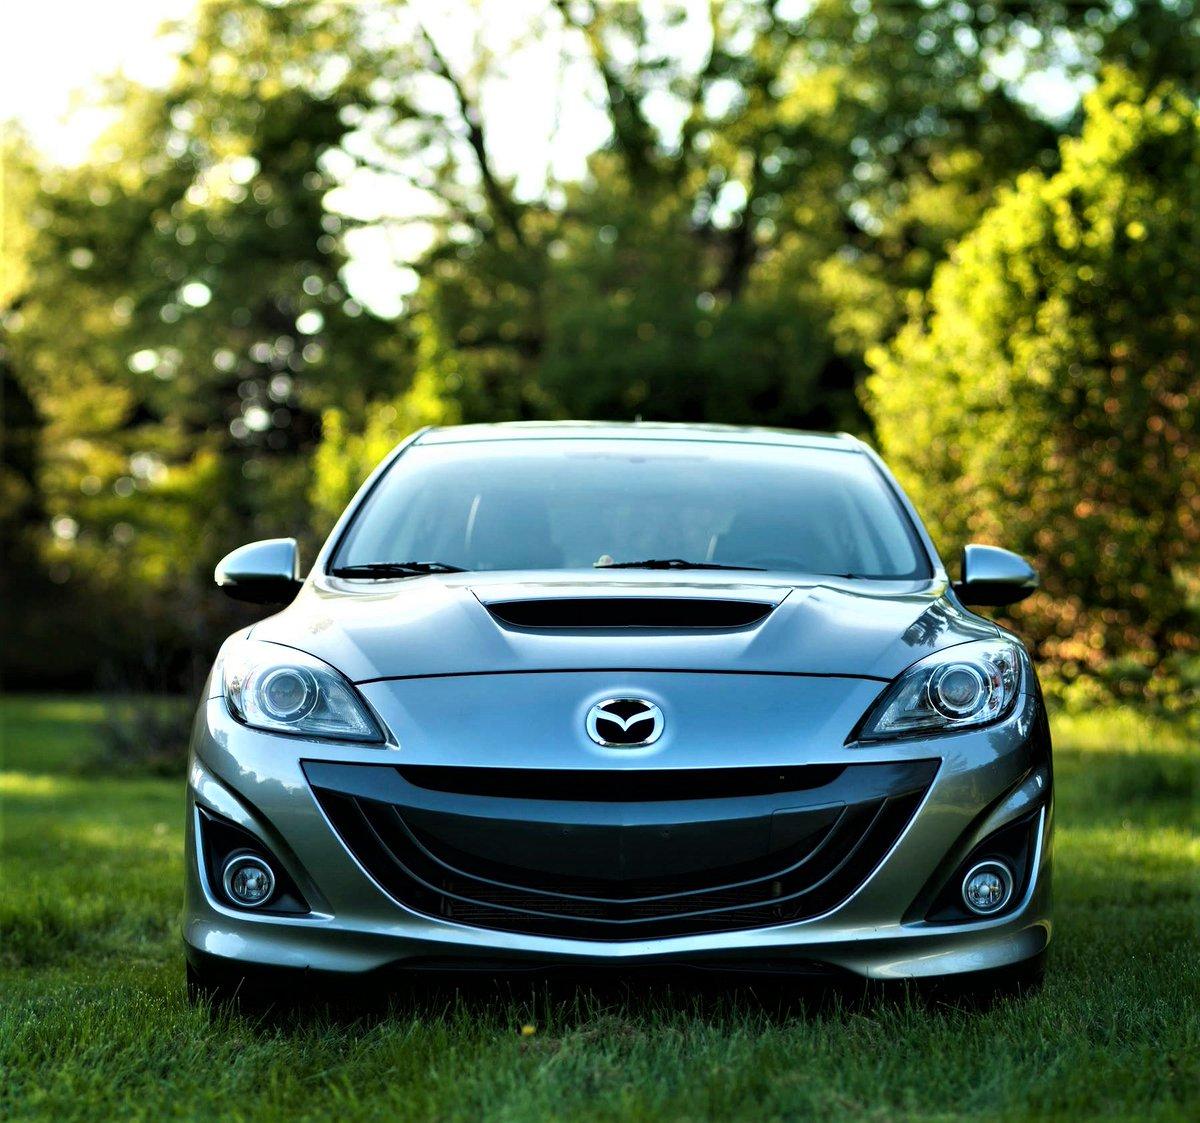 CorkSport Mazda on Twitter: